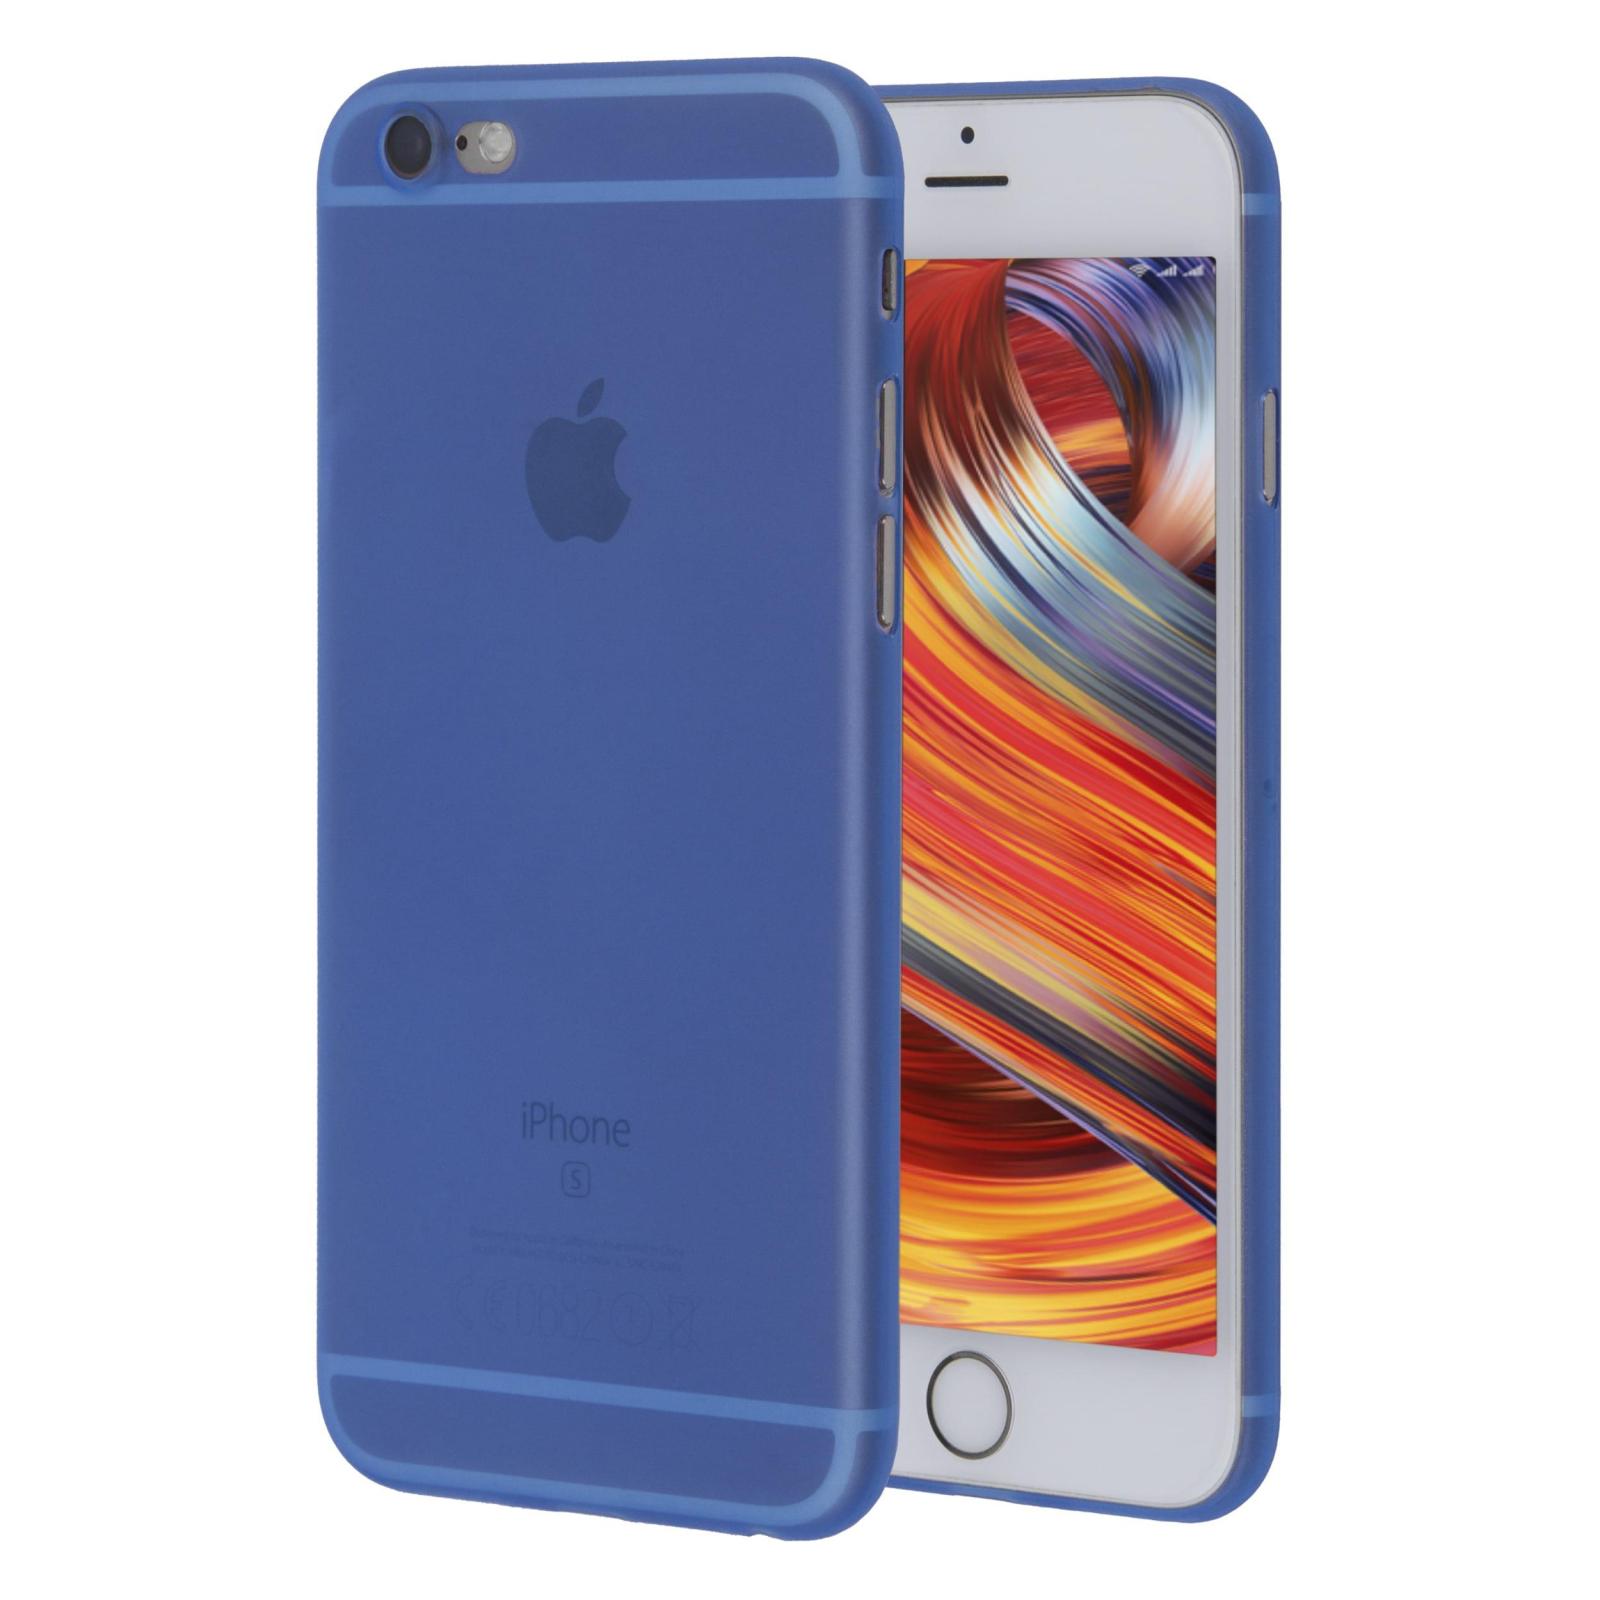 Чехол для моб. телефона MakeFuture Ice Case (PP) для Apple iPhone 6 Blue (MCI-AI6BL) изображение 2